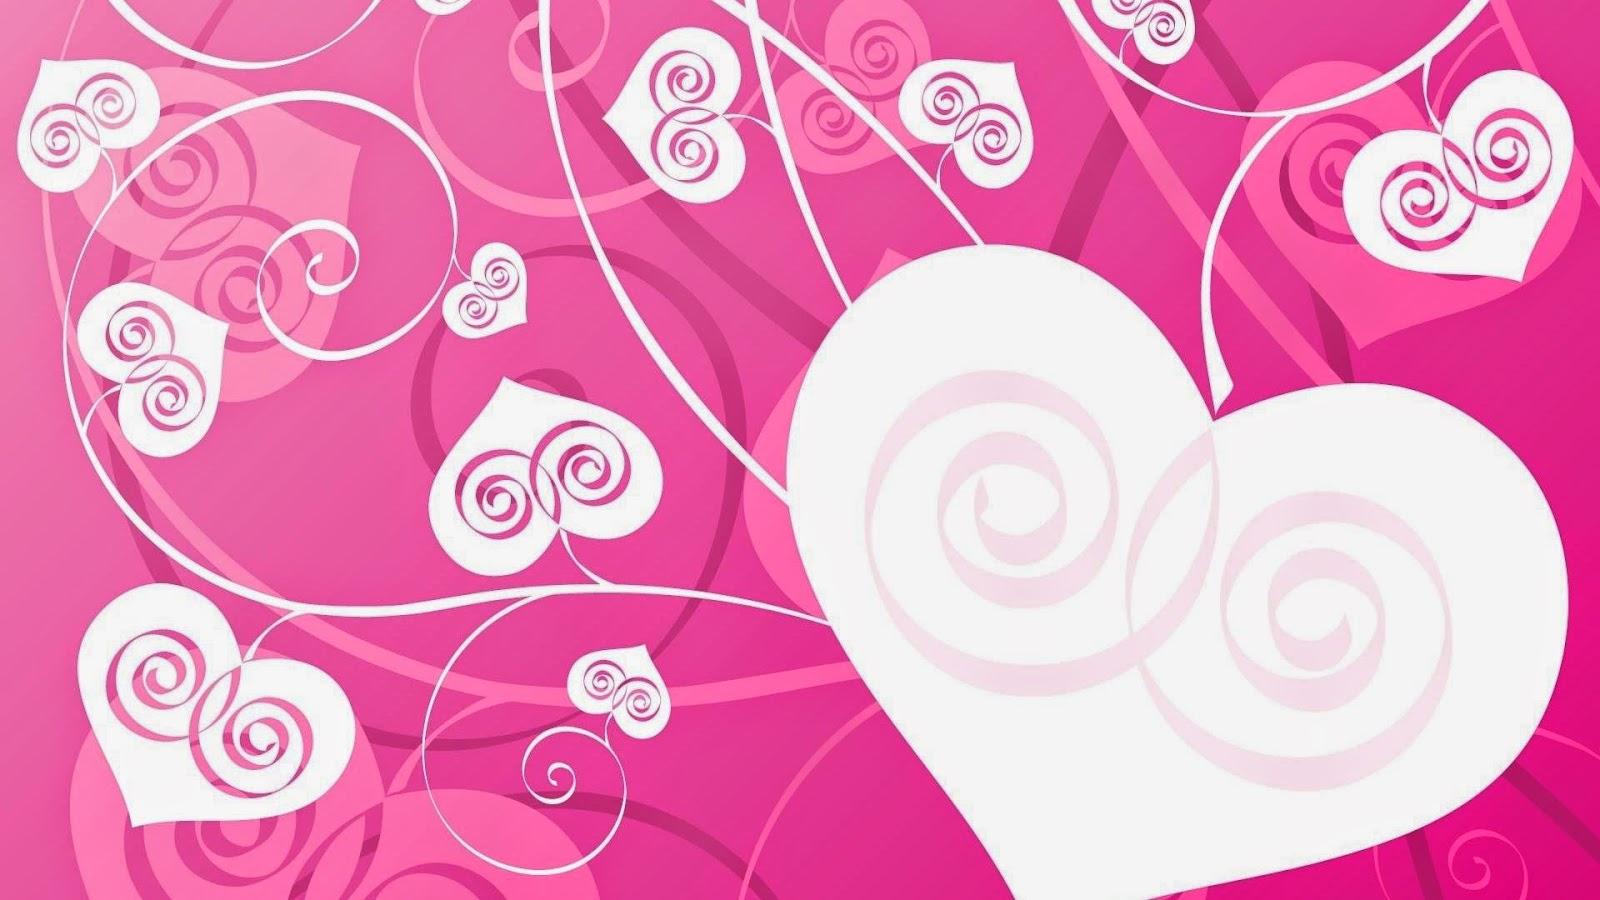 1080p Love Wallpaper